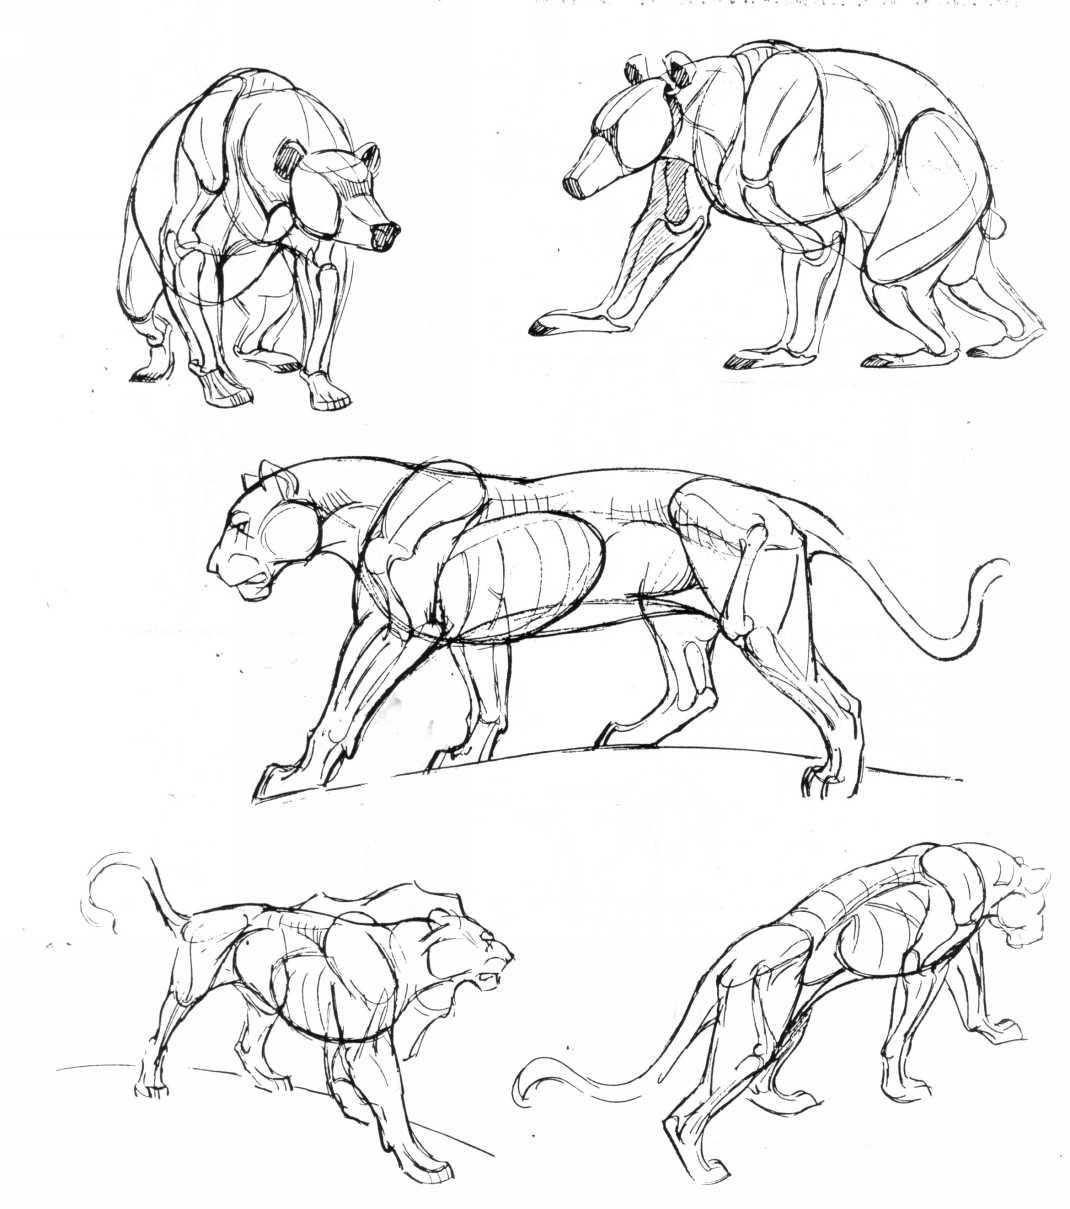 1070x1209 The Art Of Animal Drawing By Ken Hultgren Anatoref